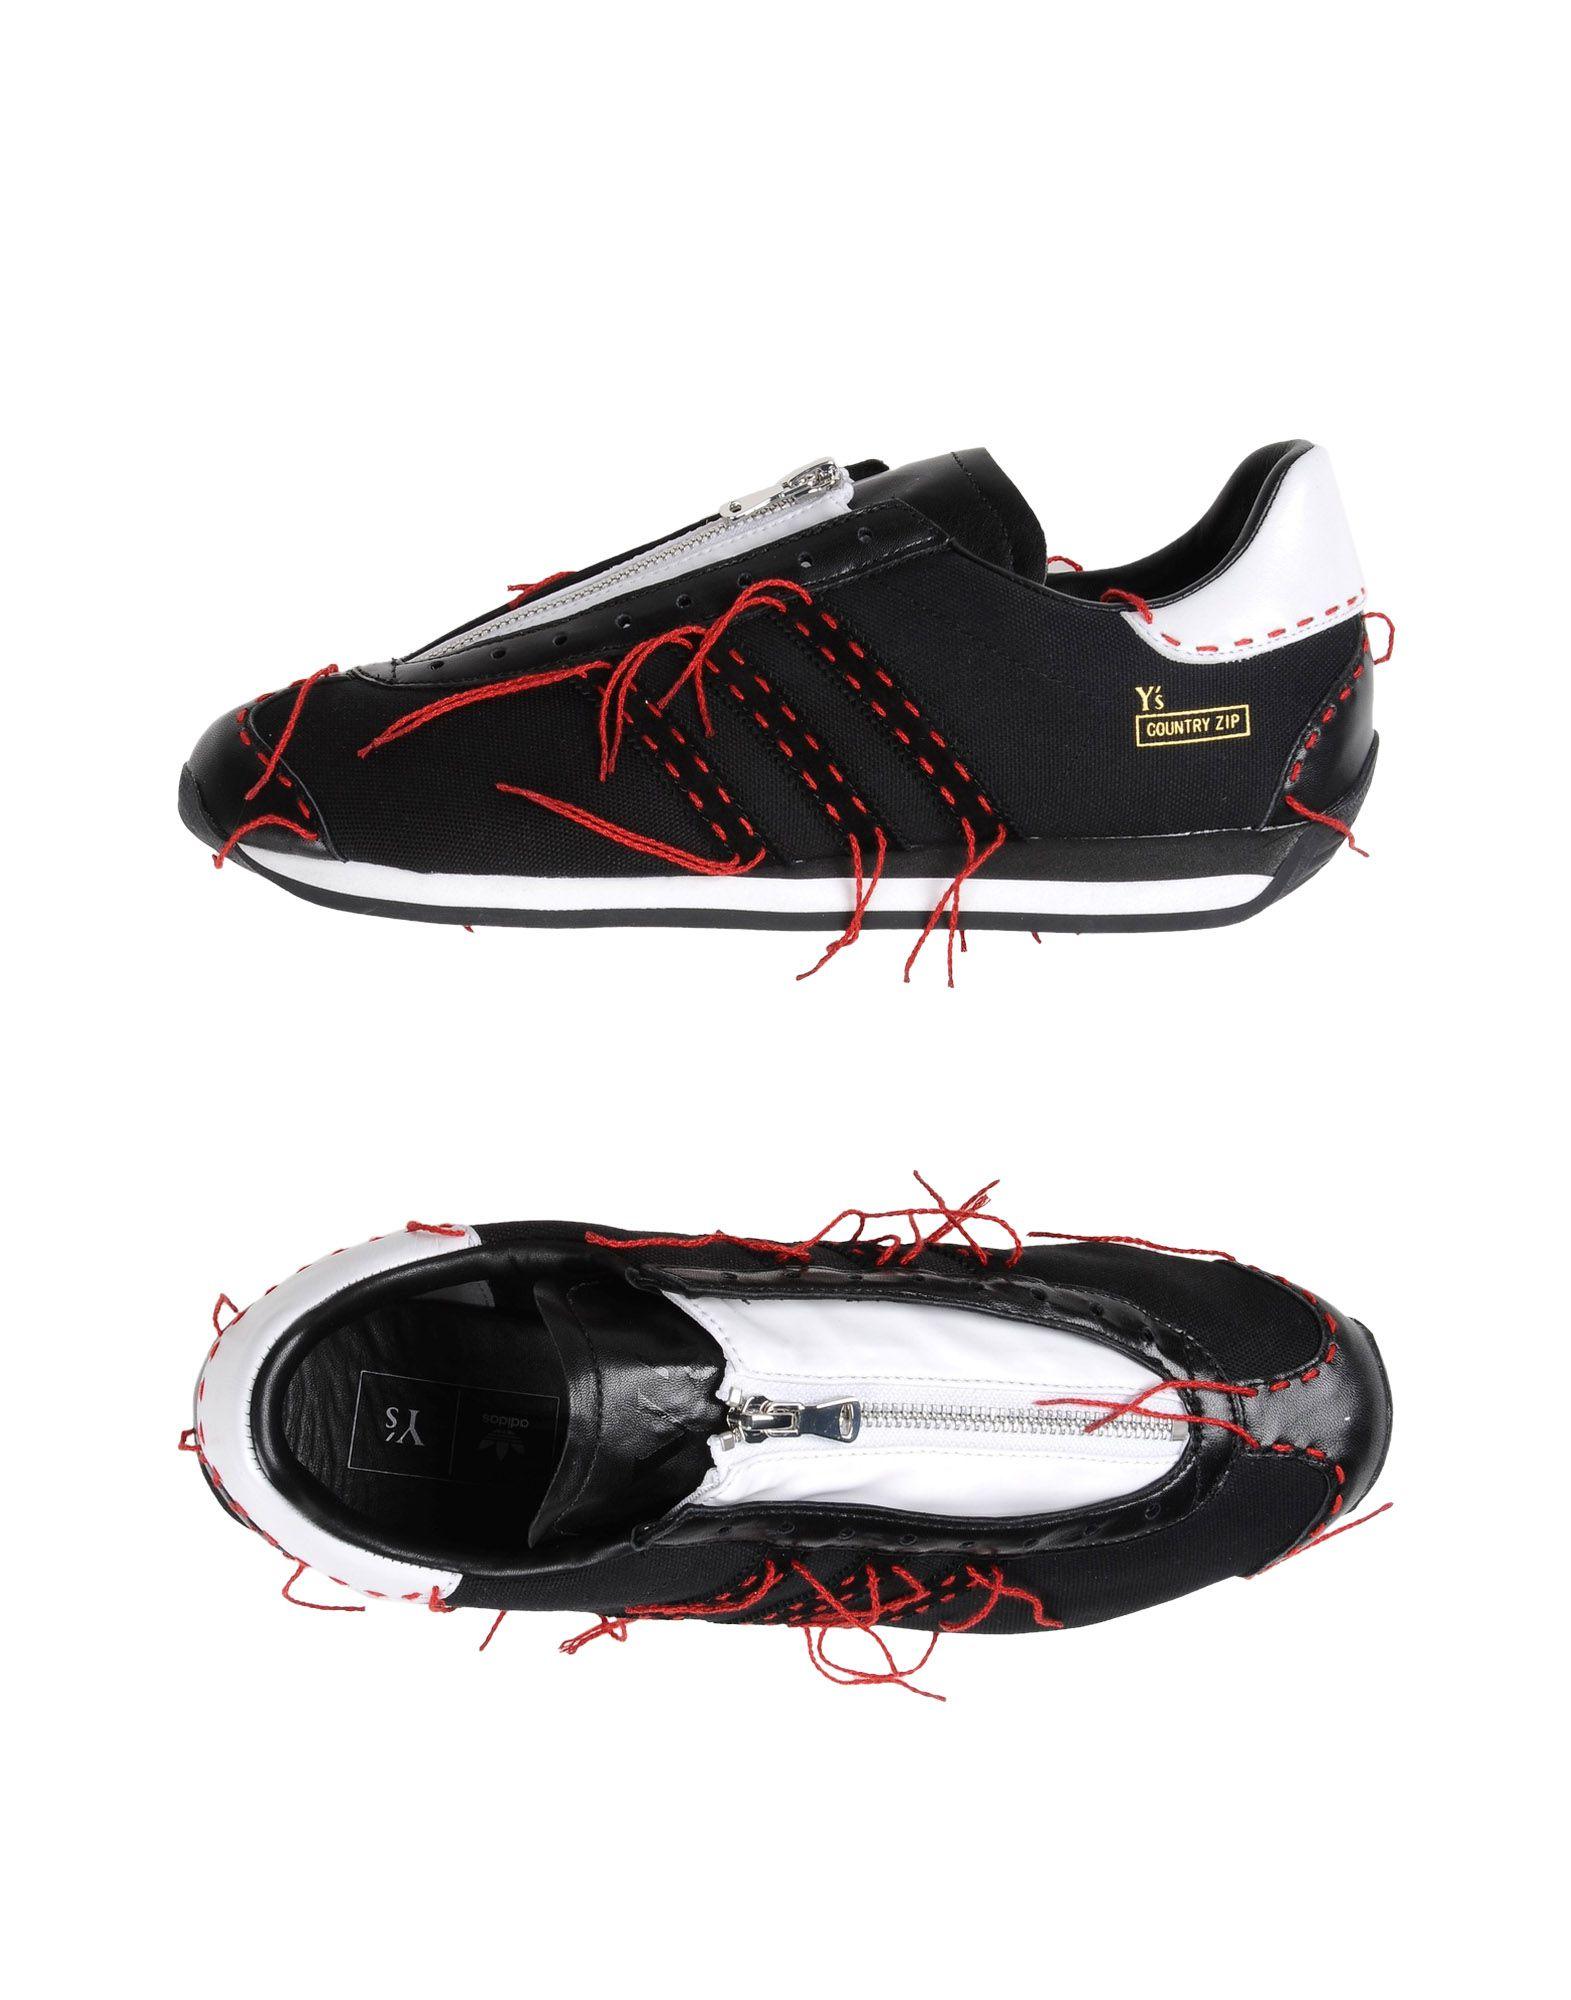 Sneakers Adidas By Yohji Yamamoto Homme - Sneakers Adidas By Yohji Yamamoto sur